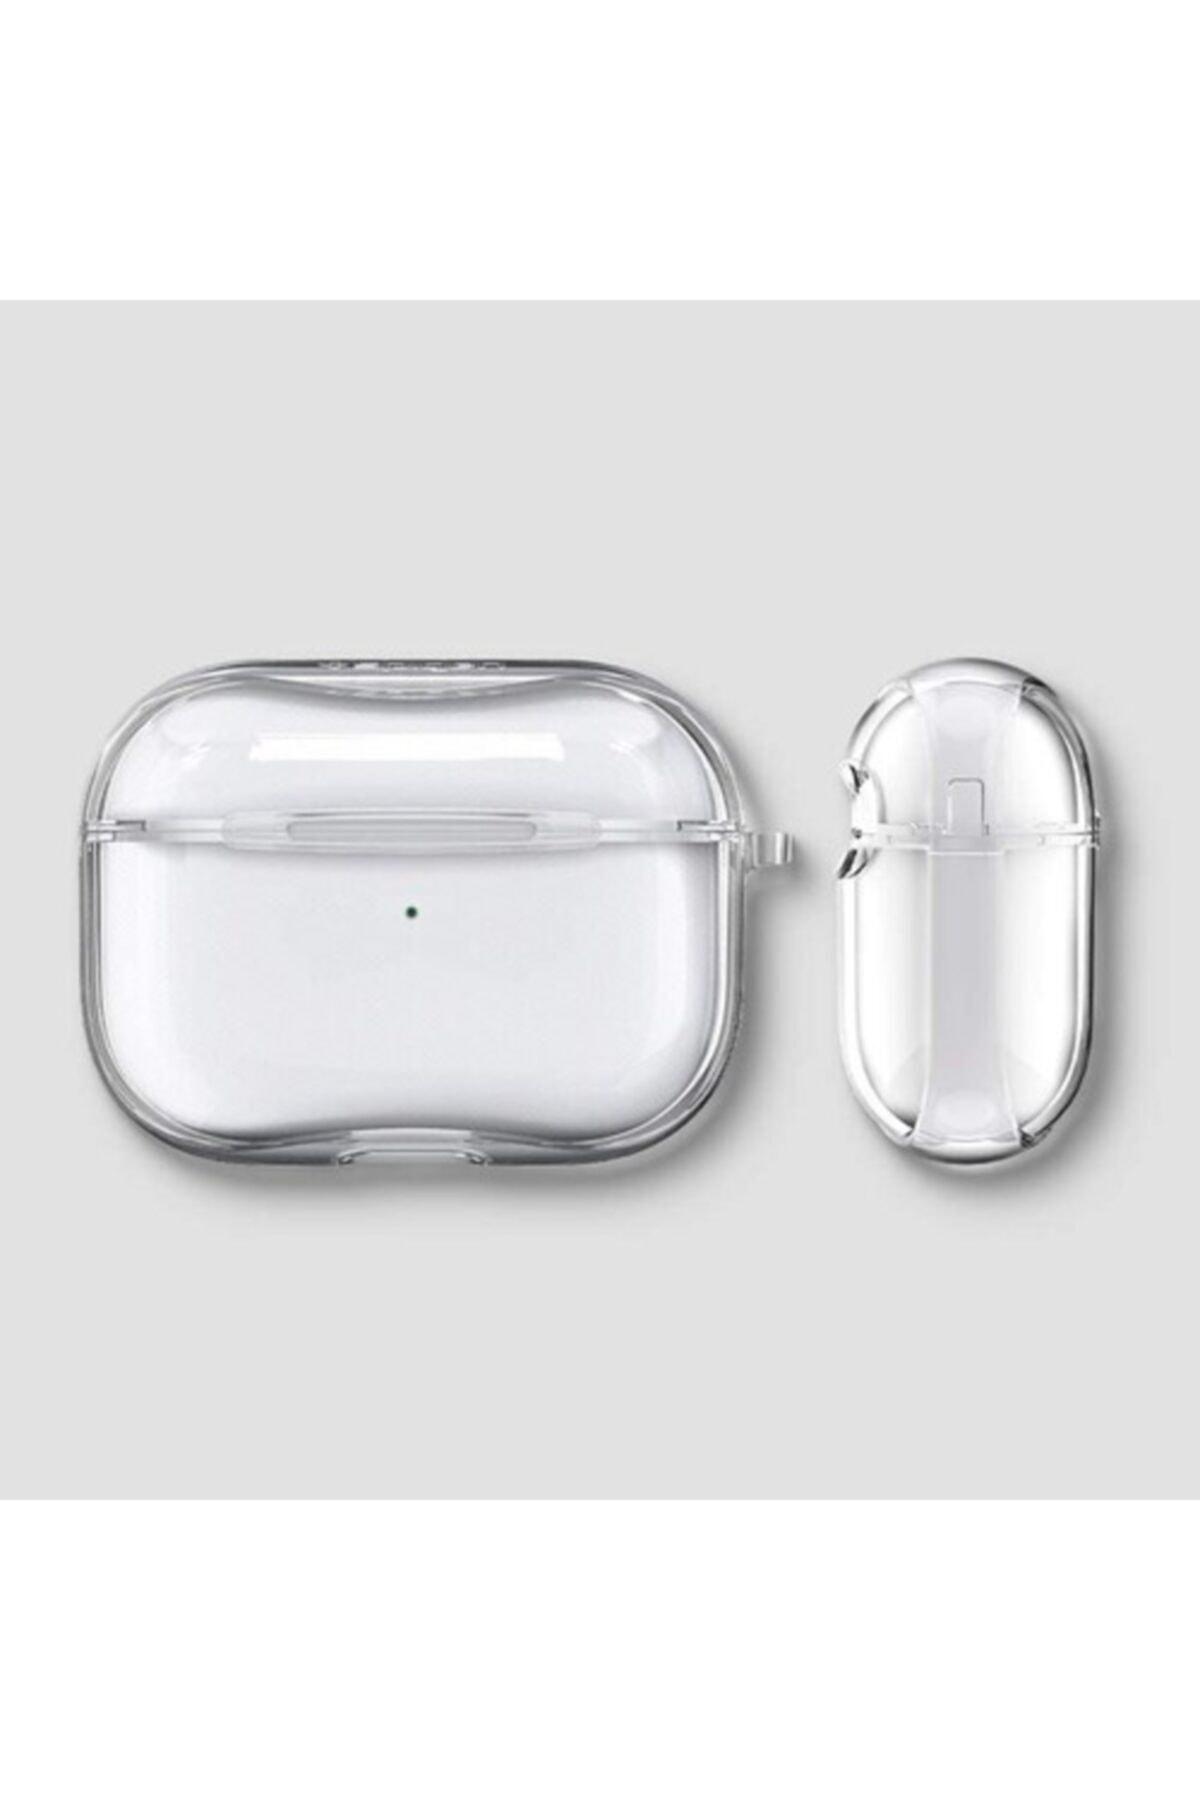 Bilişim Aksesuar Airpods Pro Şeffaf Kılıf Ultra Ince Slim 2